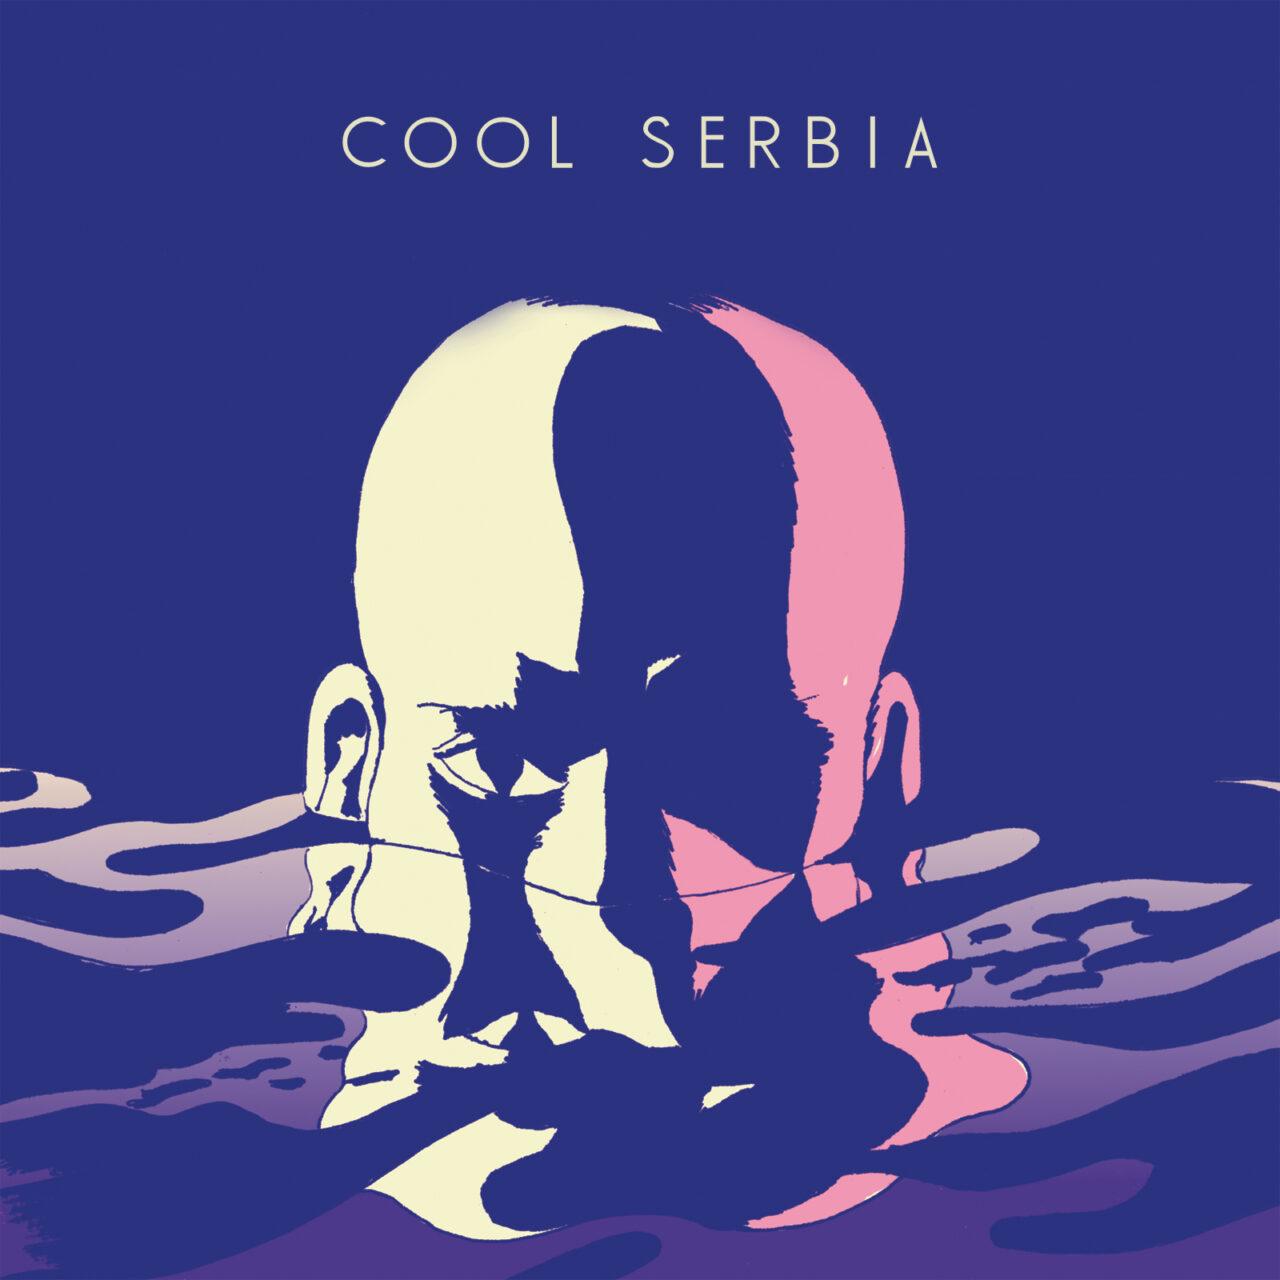 NUEVA BANDA: Cool Serbia,EP debut.